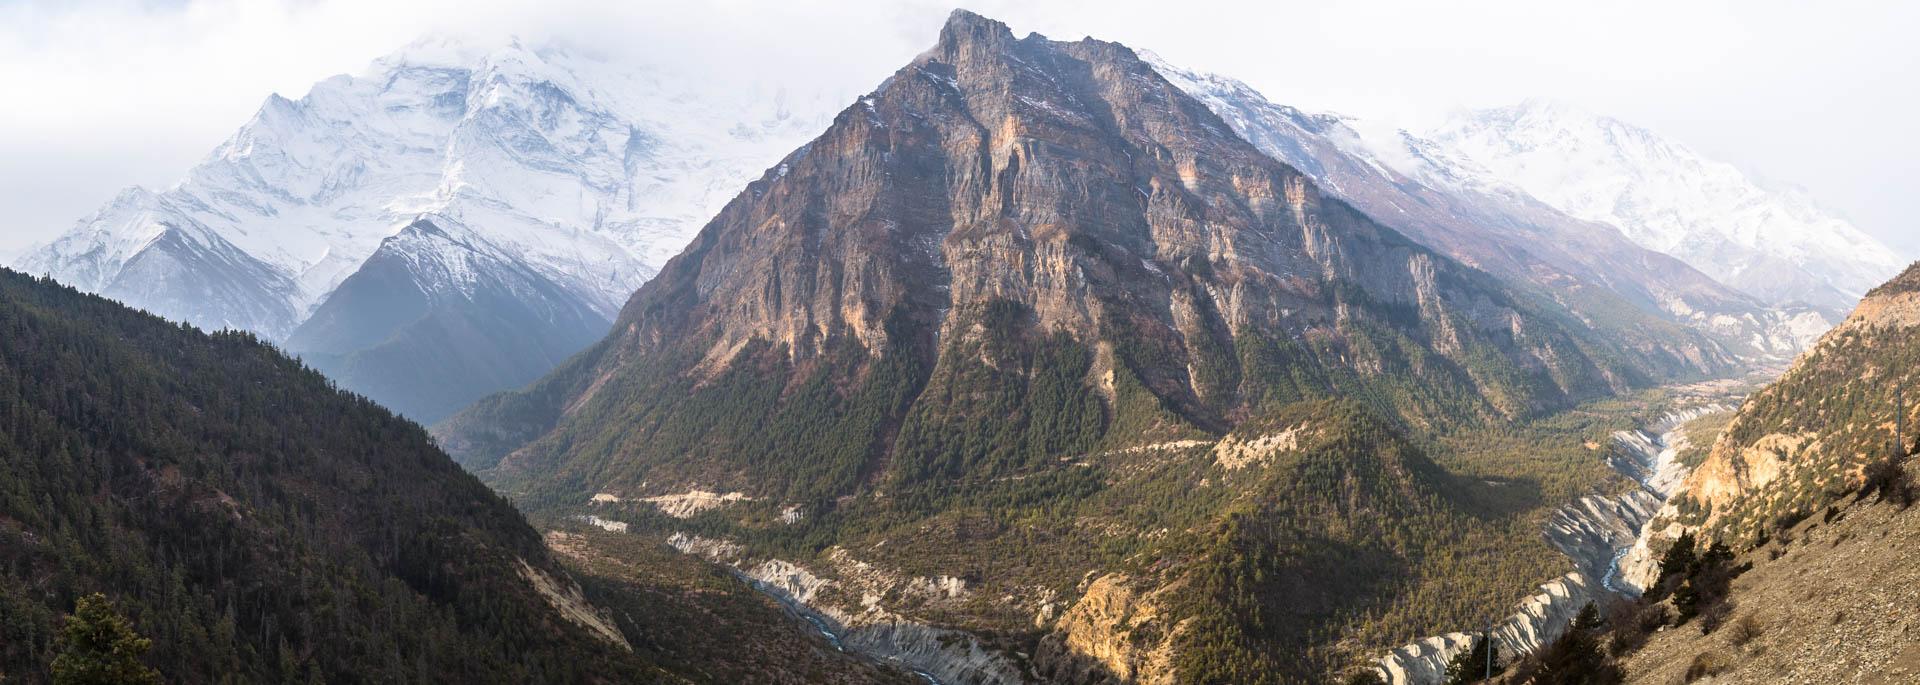 mountain scape2